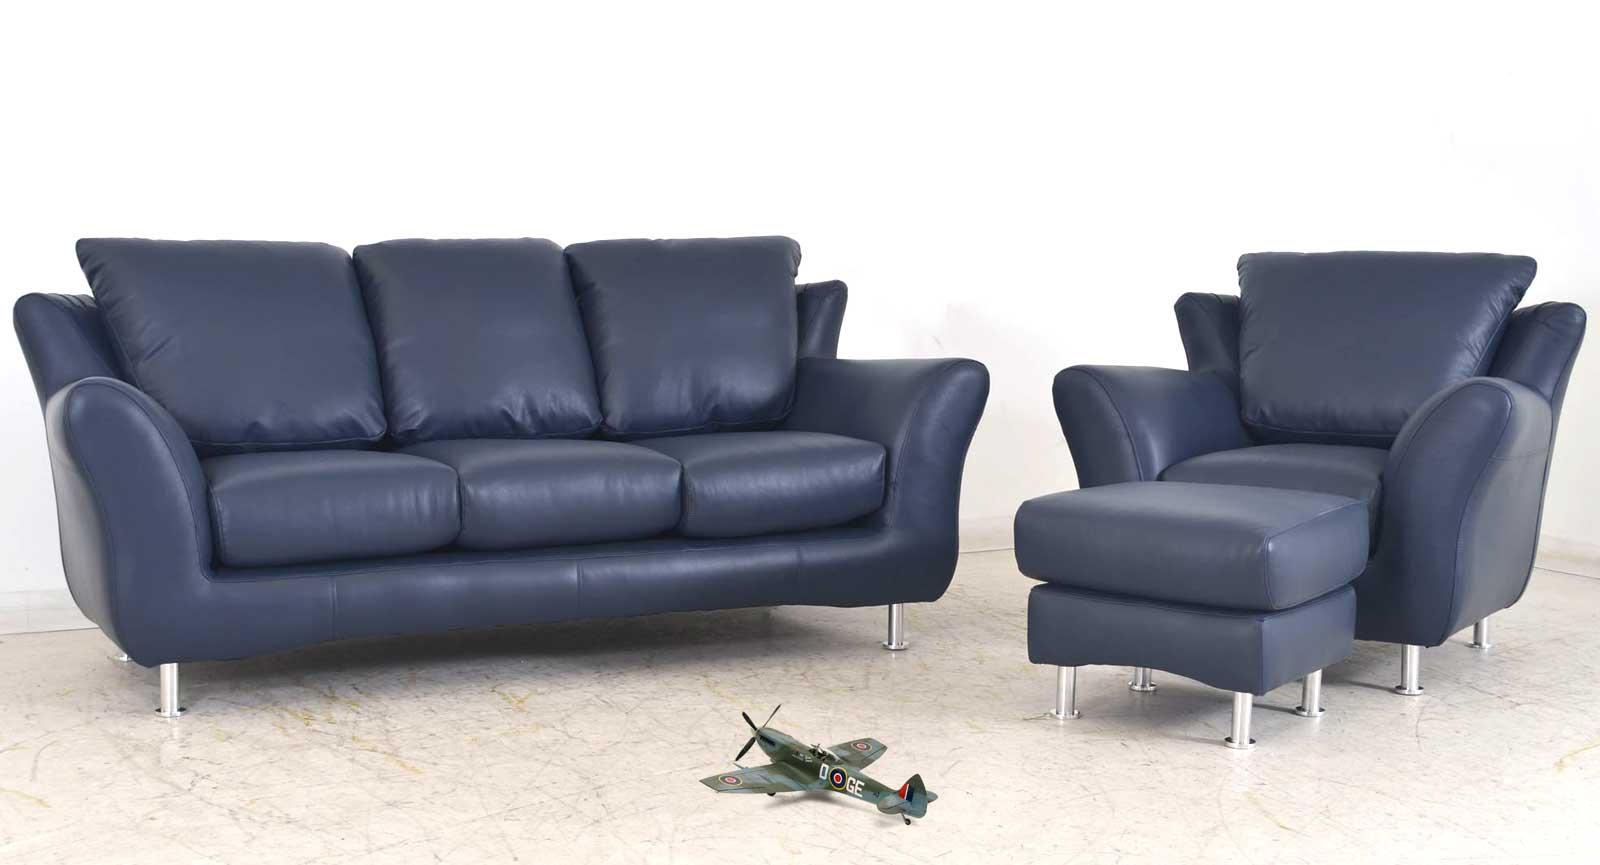 Three Seat Sofa Chair Ottoman